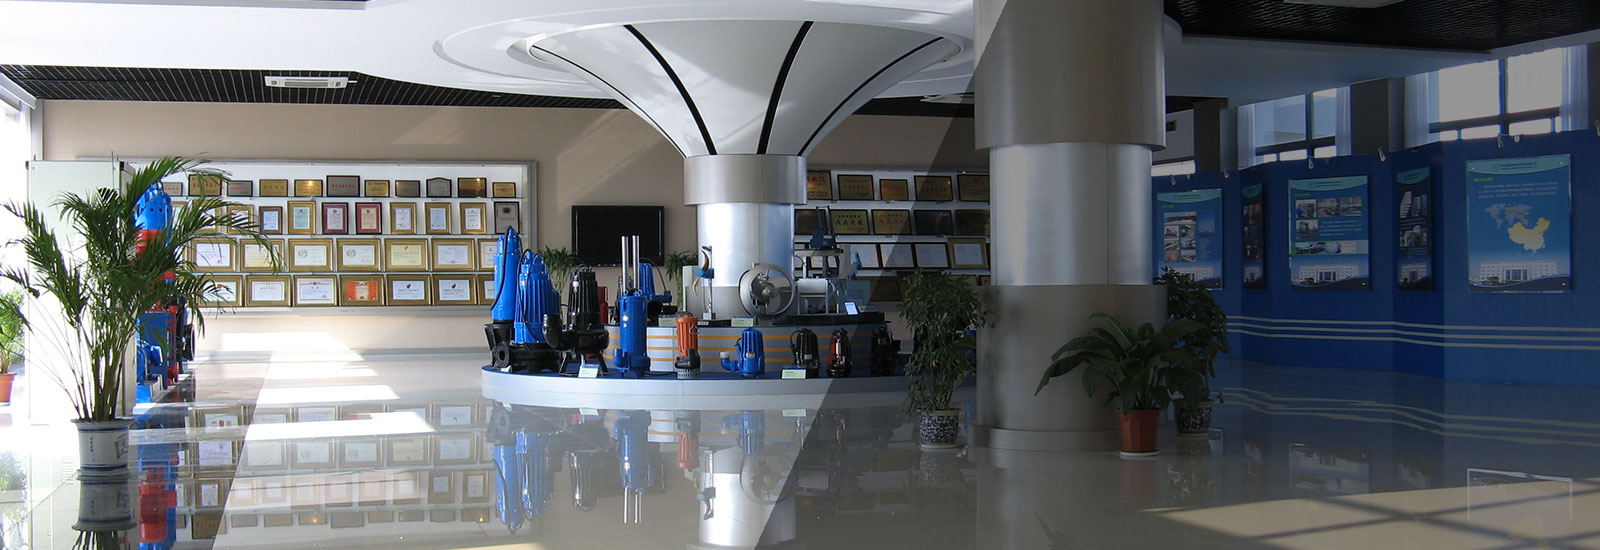 Sewage Pump manufacturer